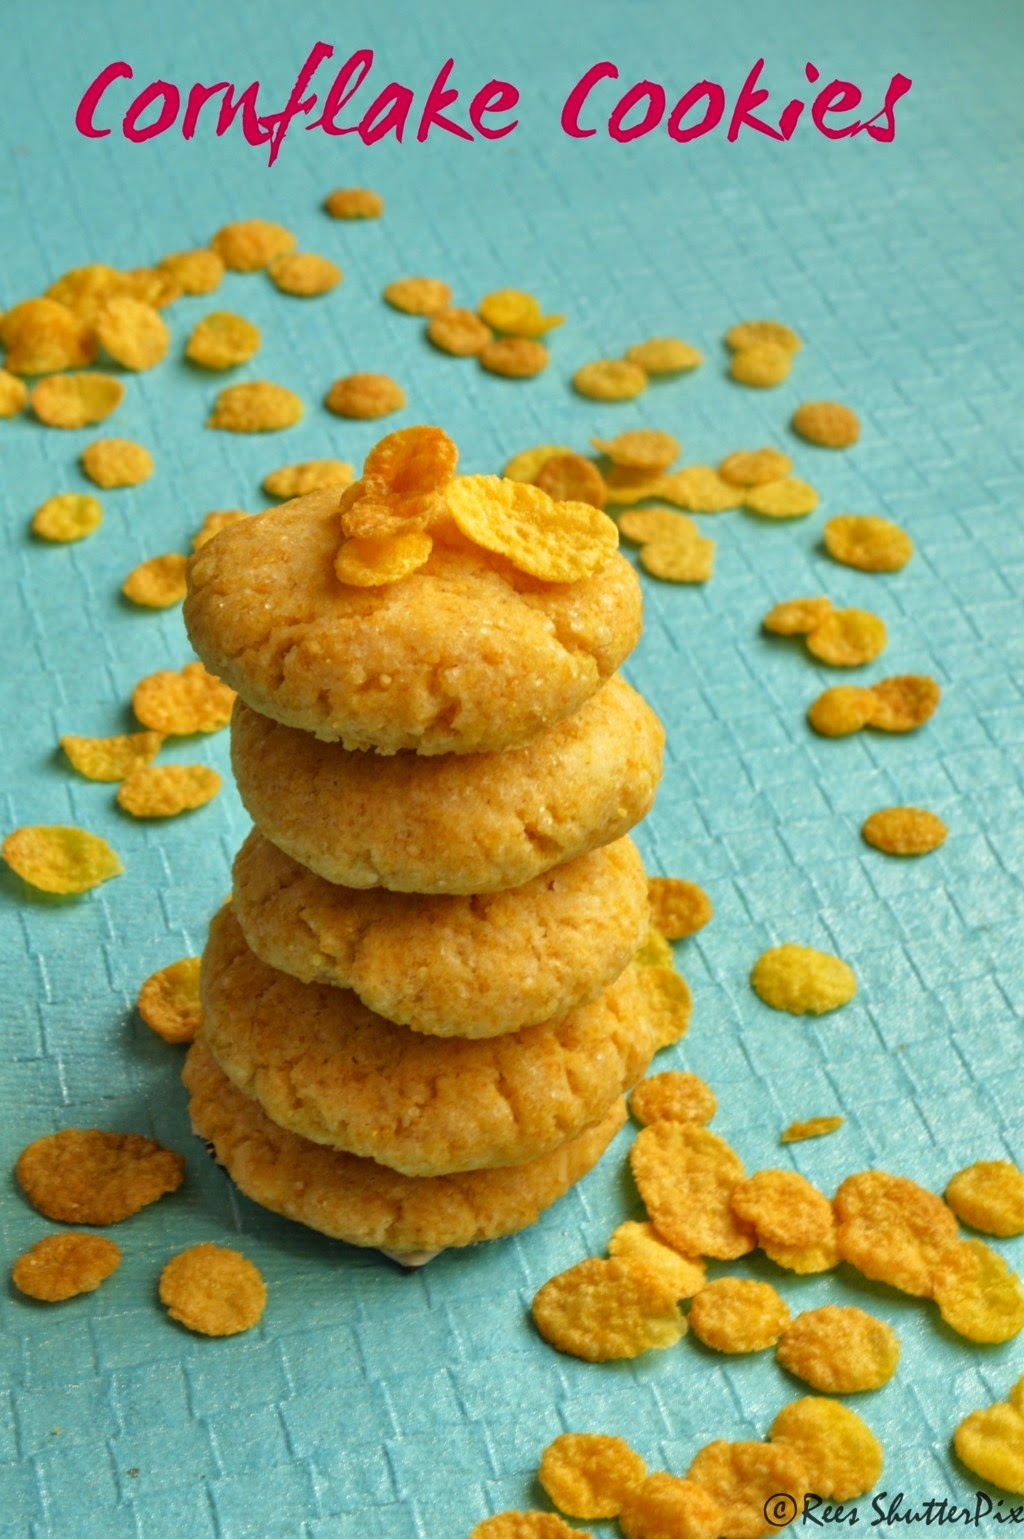 cookies, Teatime snacks, cornflakes,Cornflakes Cookies Recipe   Eggless Baking Recipes,eggless cookies, eggless cornflakes cookies recipe, lemon cookies, lemon cookies recipe, crushed cornflakes cookies, easy cookie recipe,